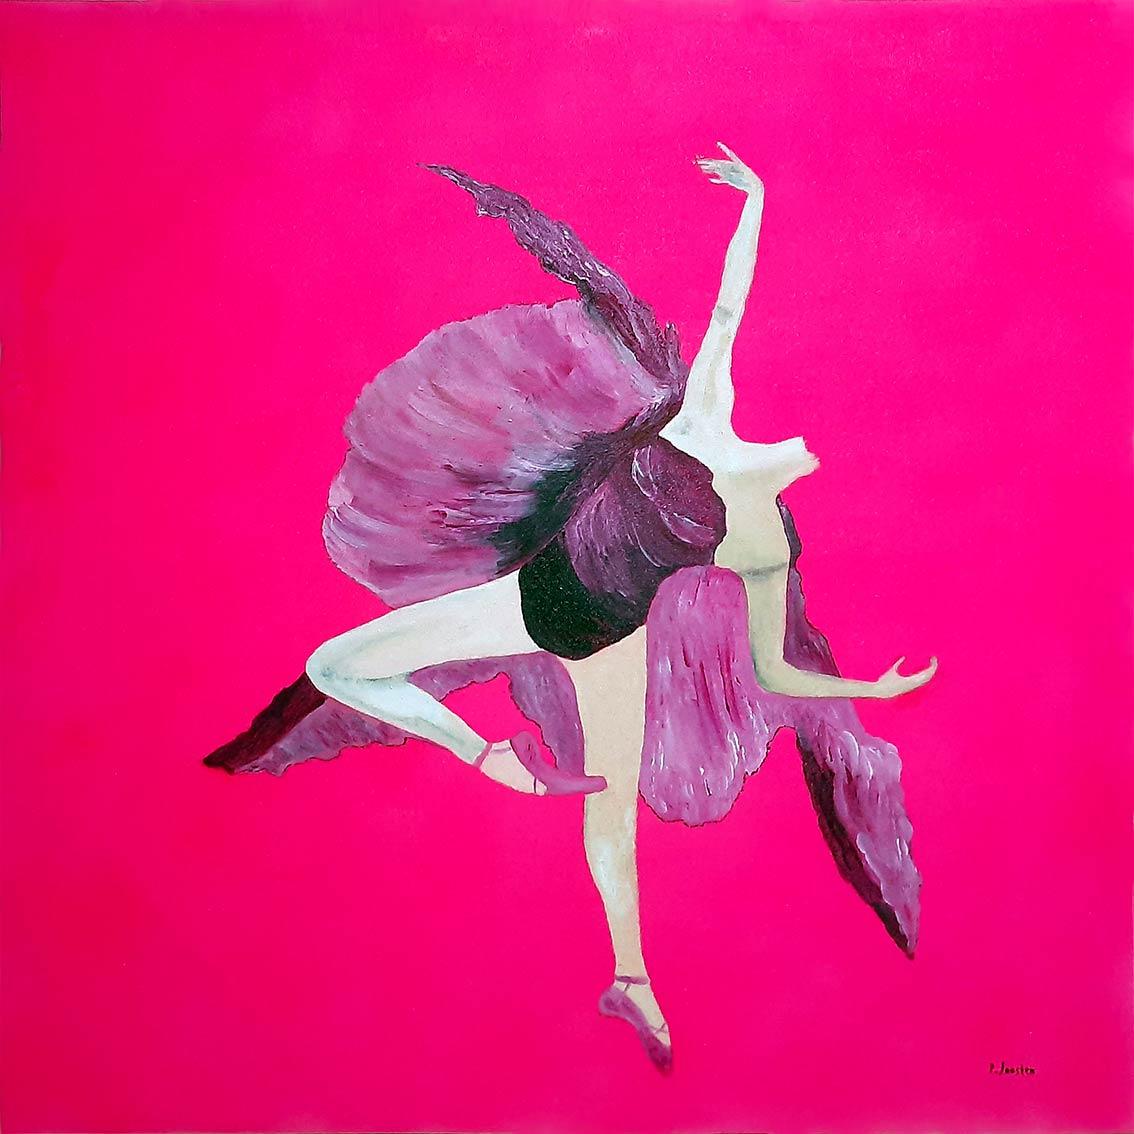 Body-Dancer-Patrick-Joosten-2020-December-08th-A